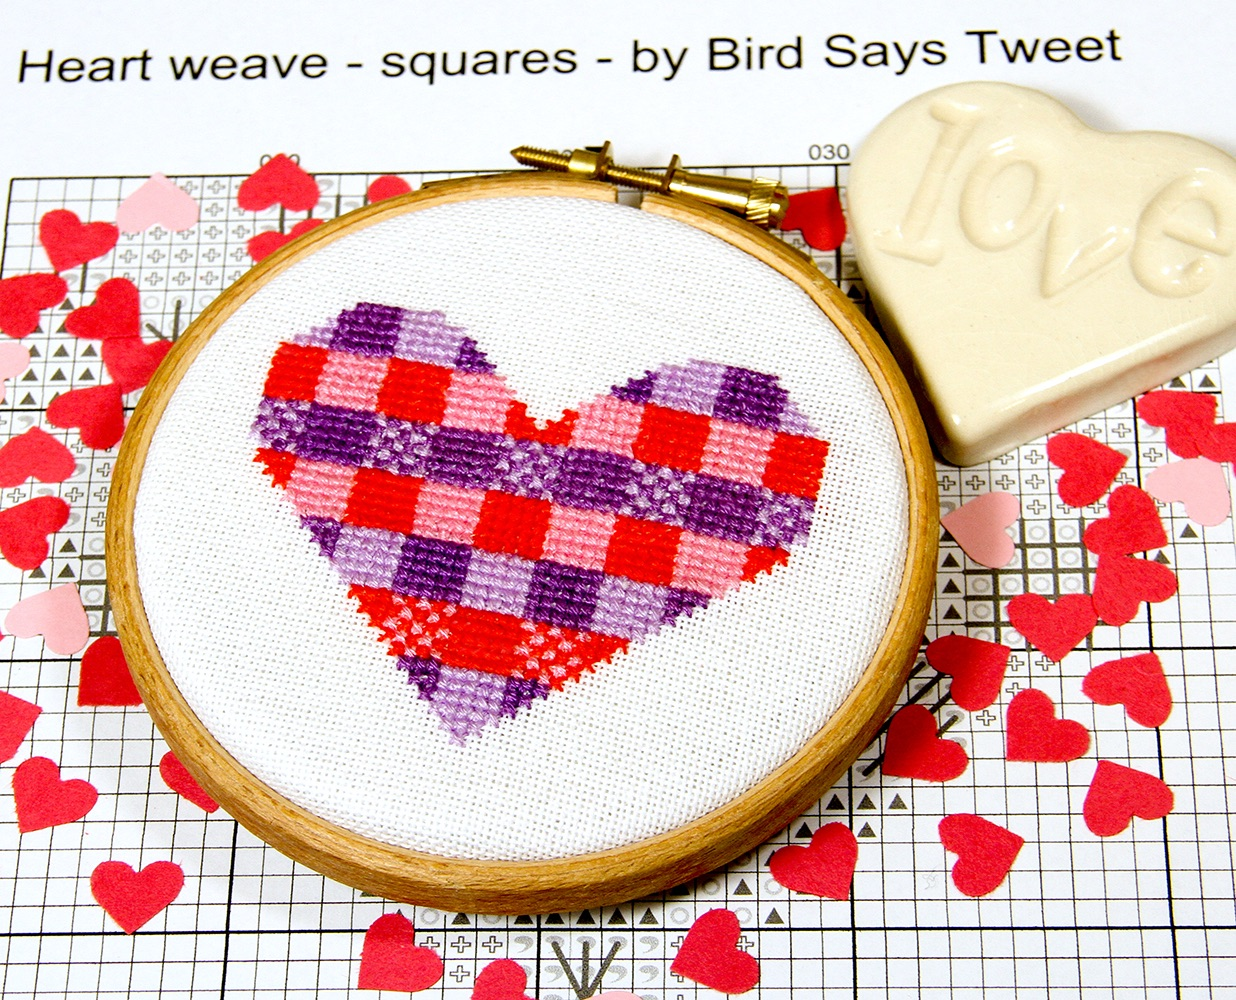 Bird Says Tweet Paintbox Collection heart cross stitch design